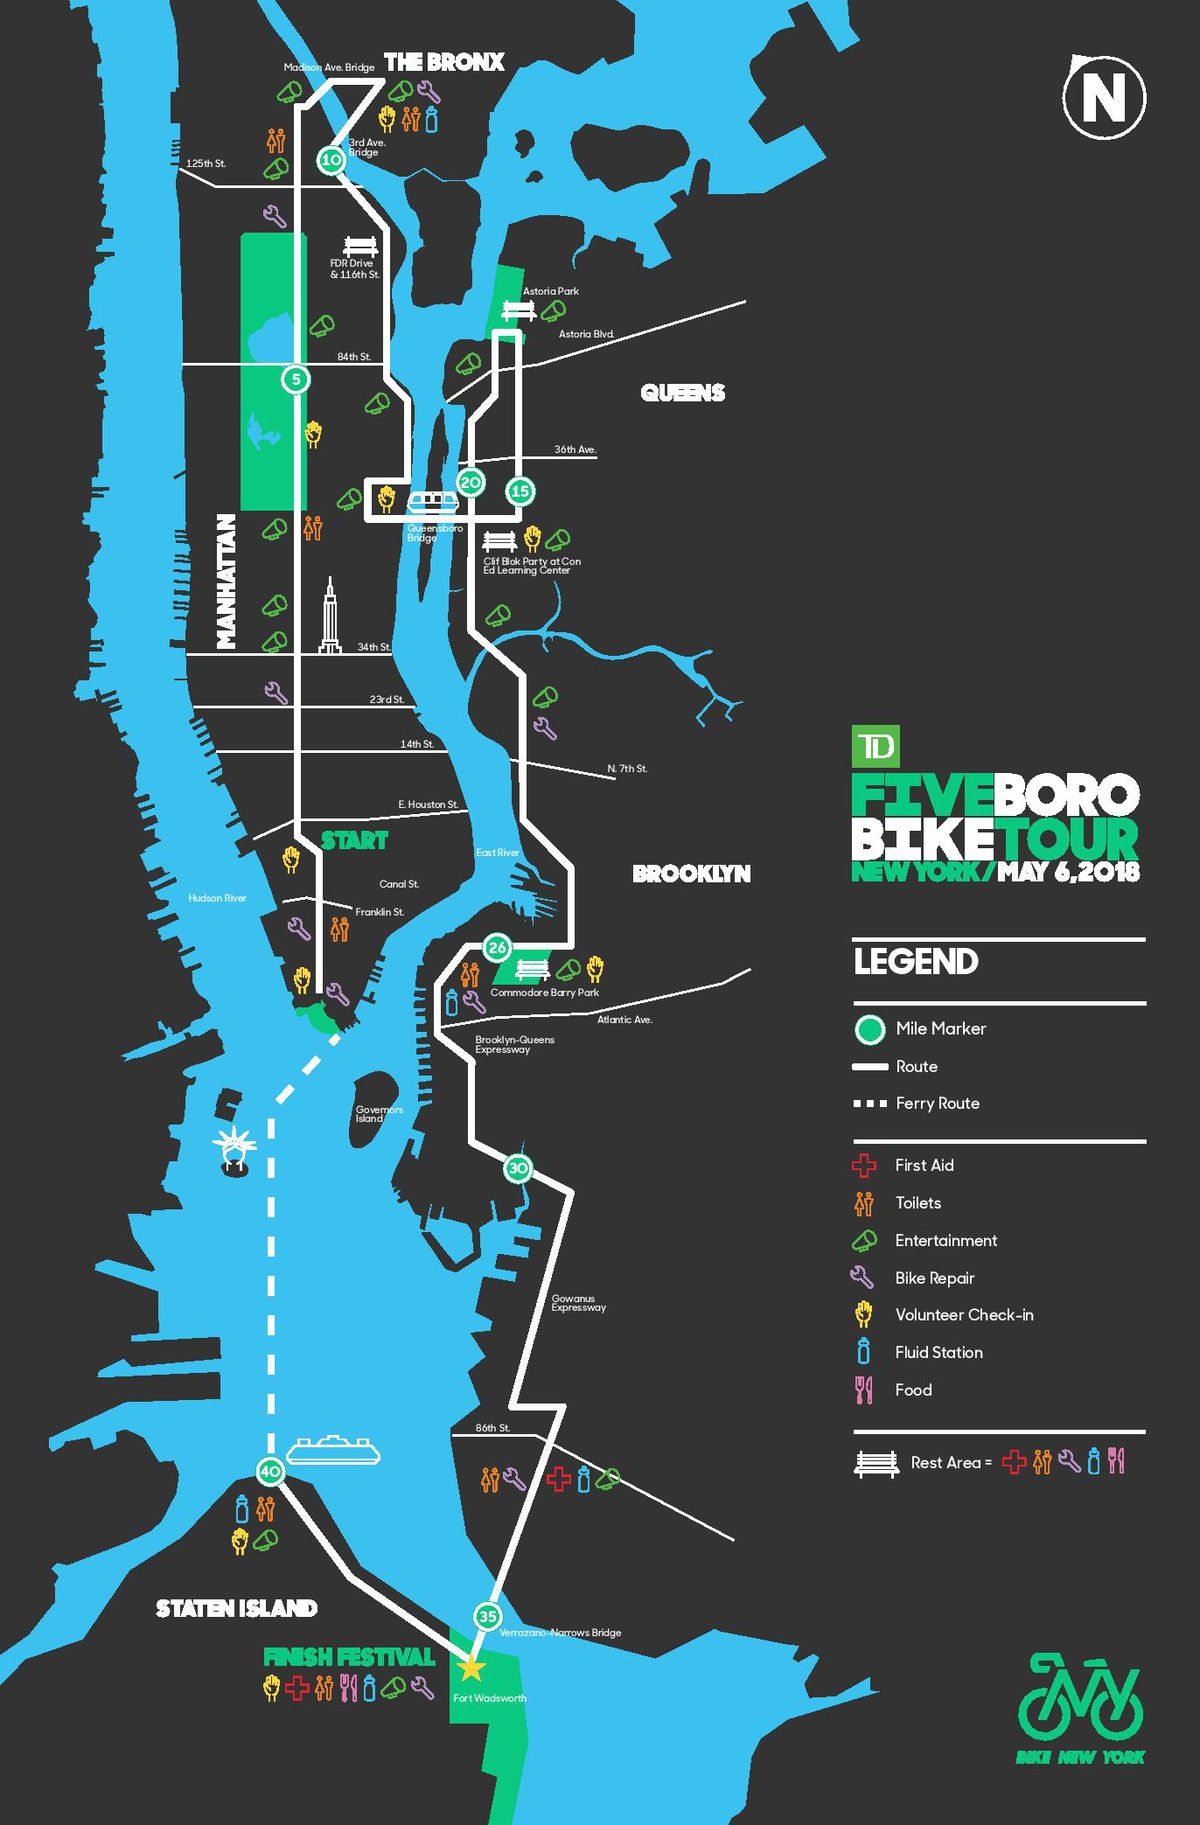 Bike New York Map.Td Five Boro Bike Tour Map Road Closures Start Times And More